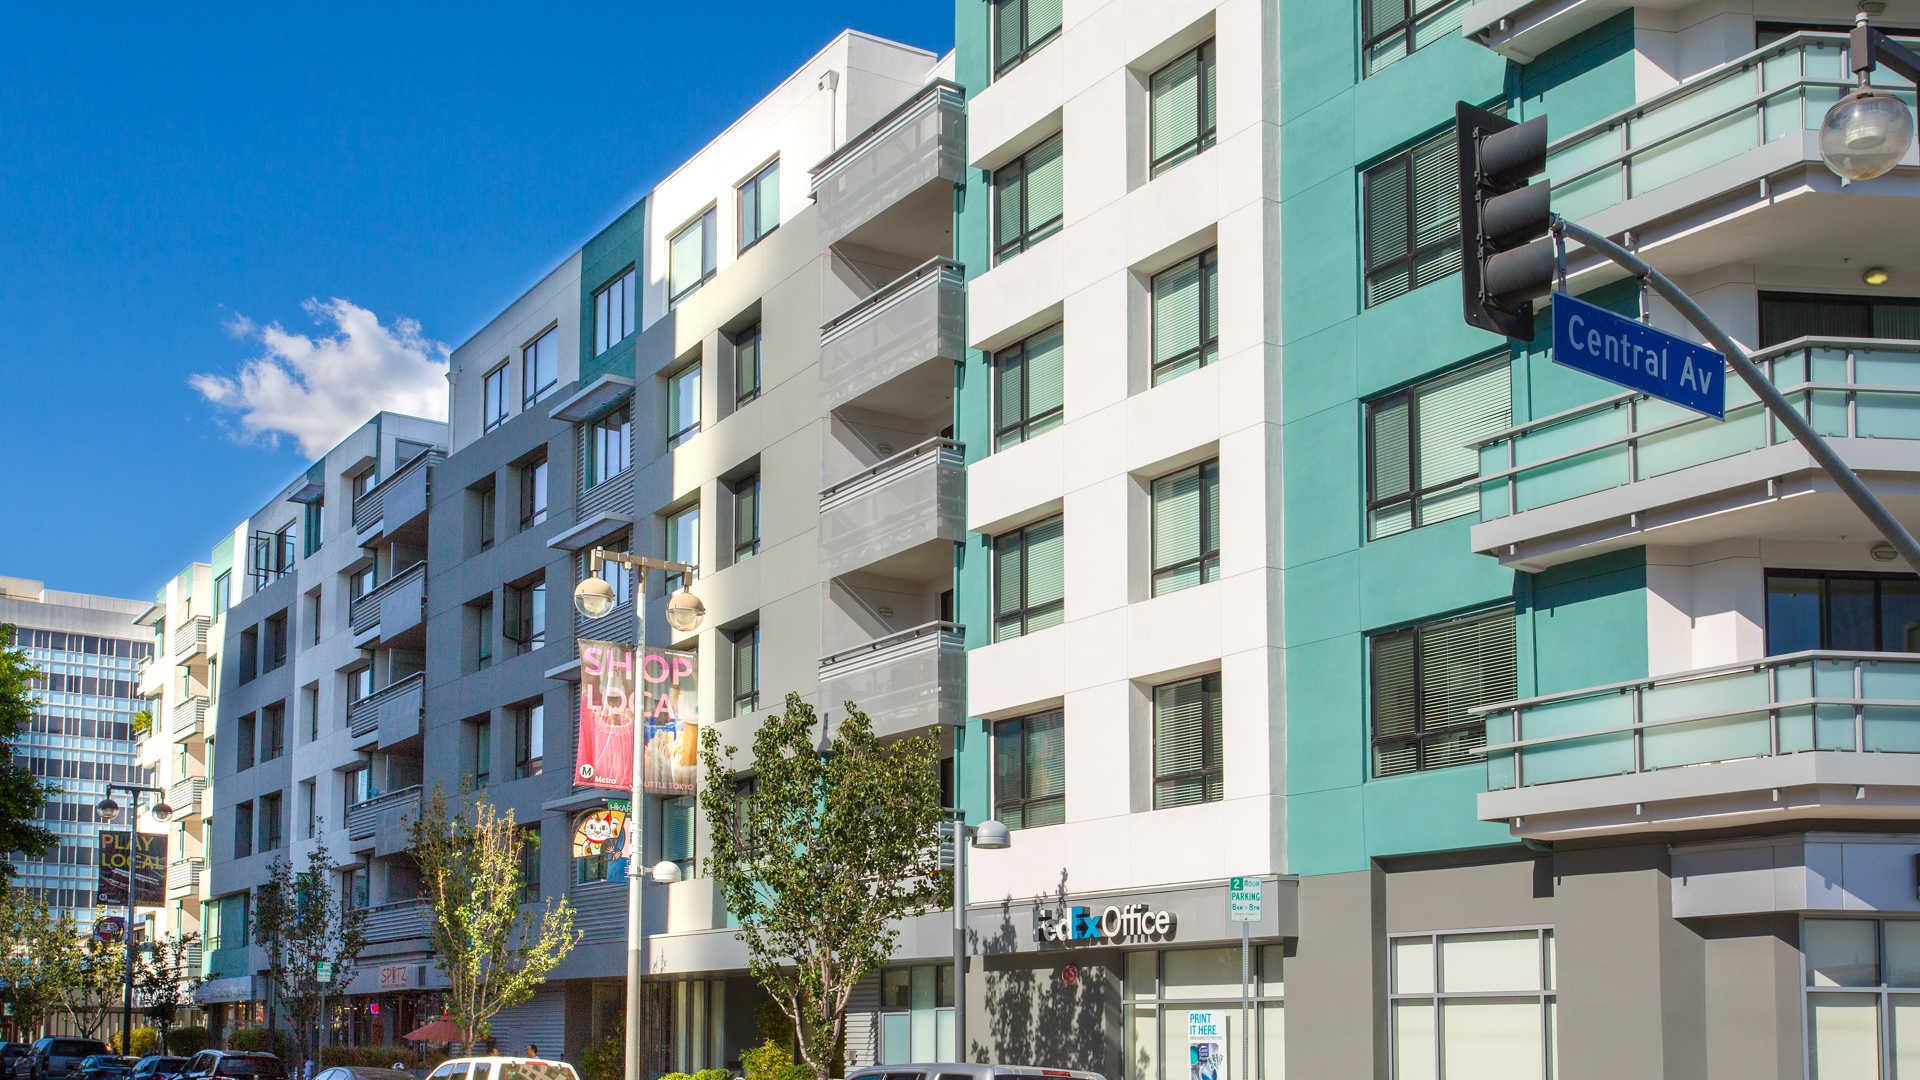 Hikari Apartments Little Tokyo Los Angeles 375 East 2nd St Equityapartments